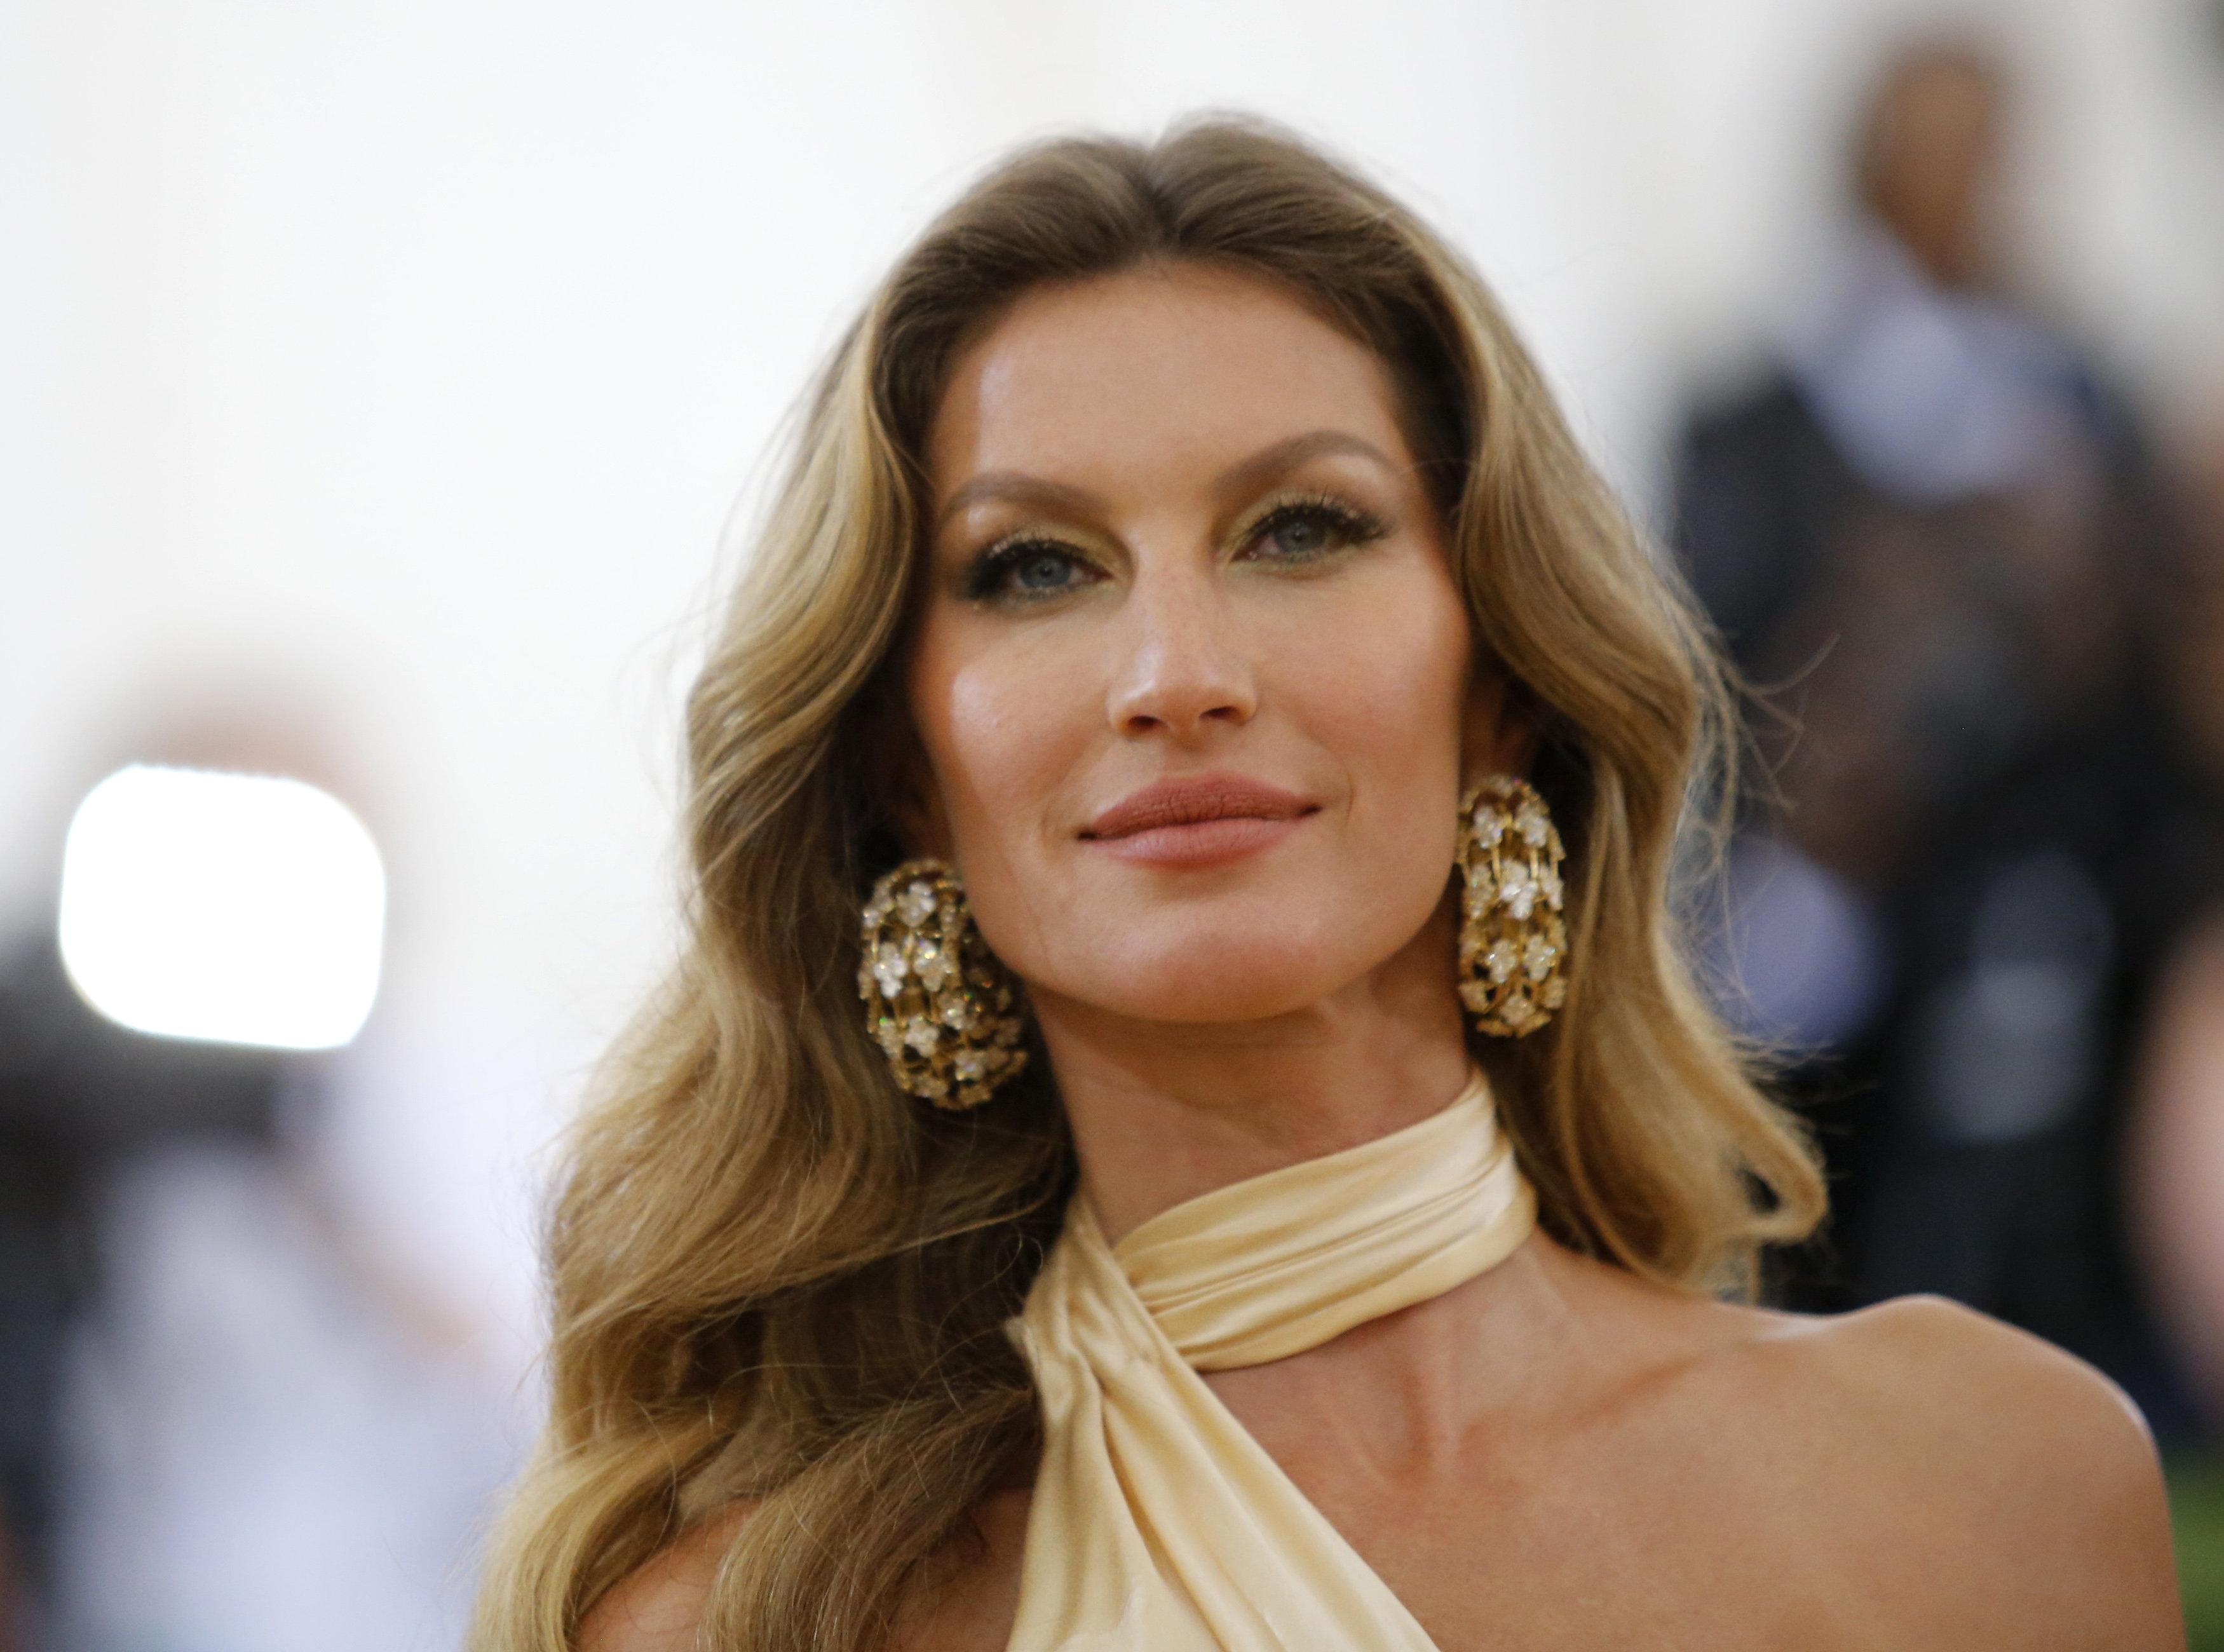 Vogue: Η συγνώμη της Gisele Bundchen για τα σχόλια προς τα νέα μοντέλα που χρησιμοποιούν το Instagram...